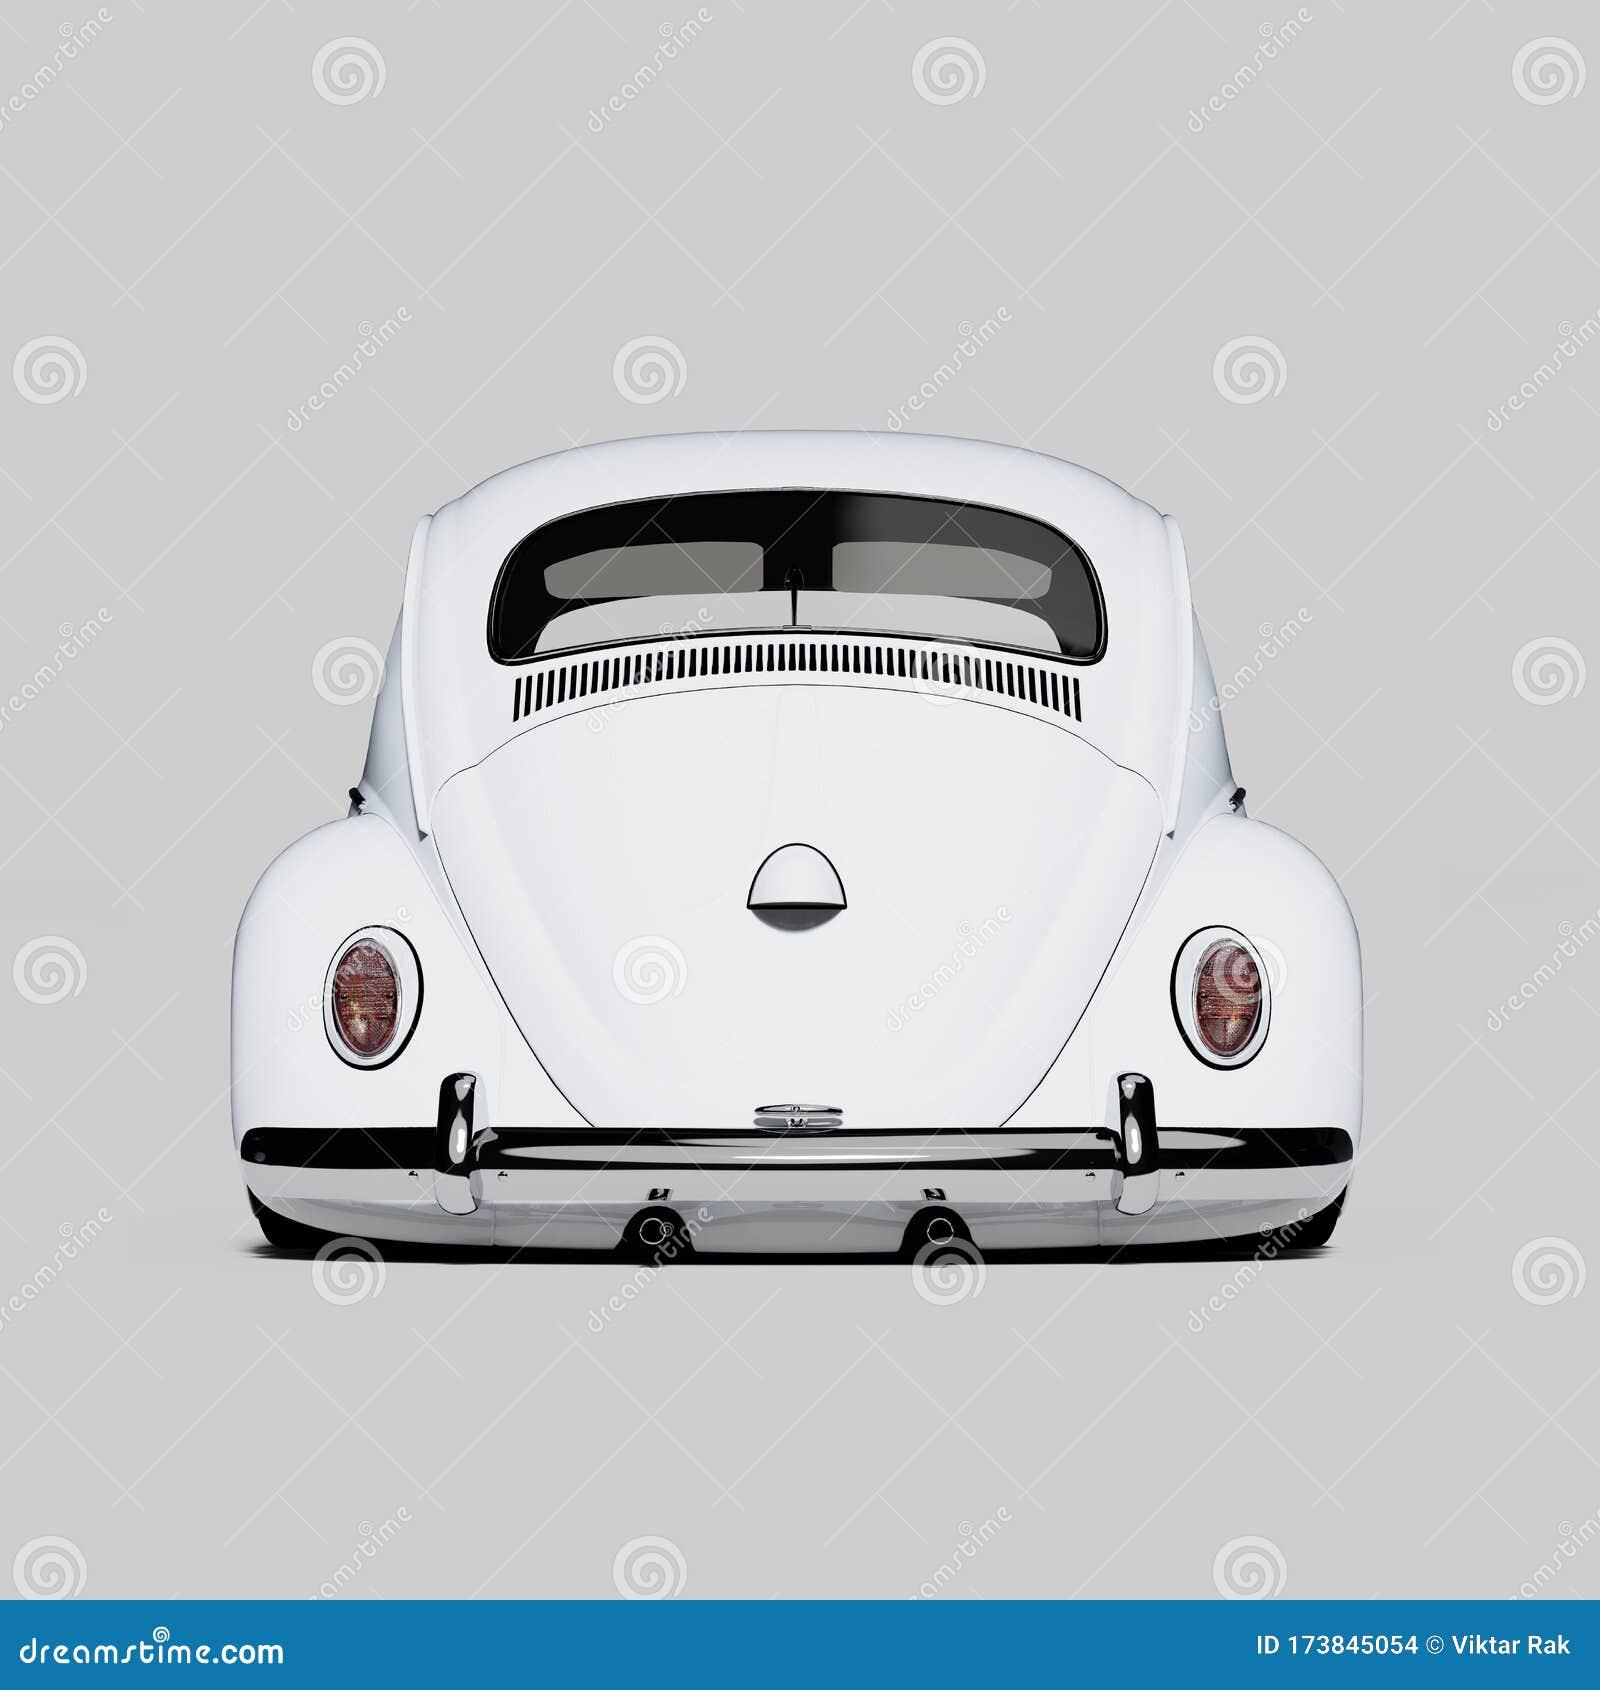 Bug Volkswagen Stock Illustrations 126 Bug Volkswagen Stock Illustrations Vectors Clipart Dreamstime